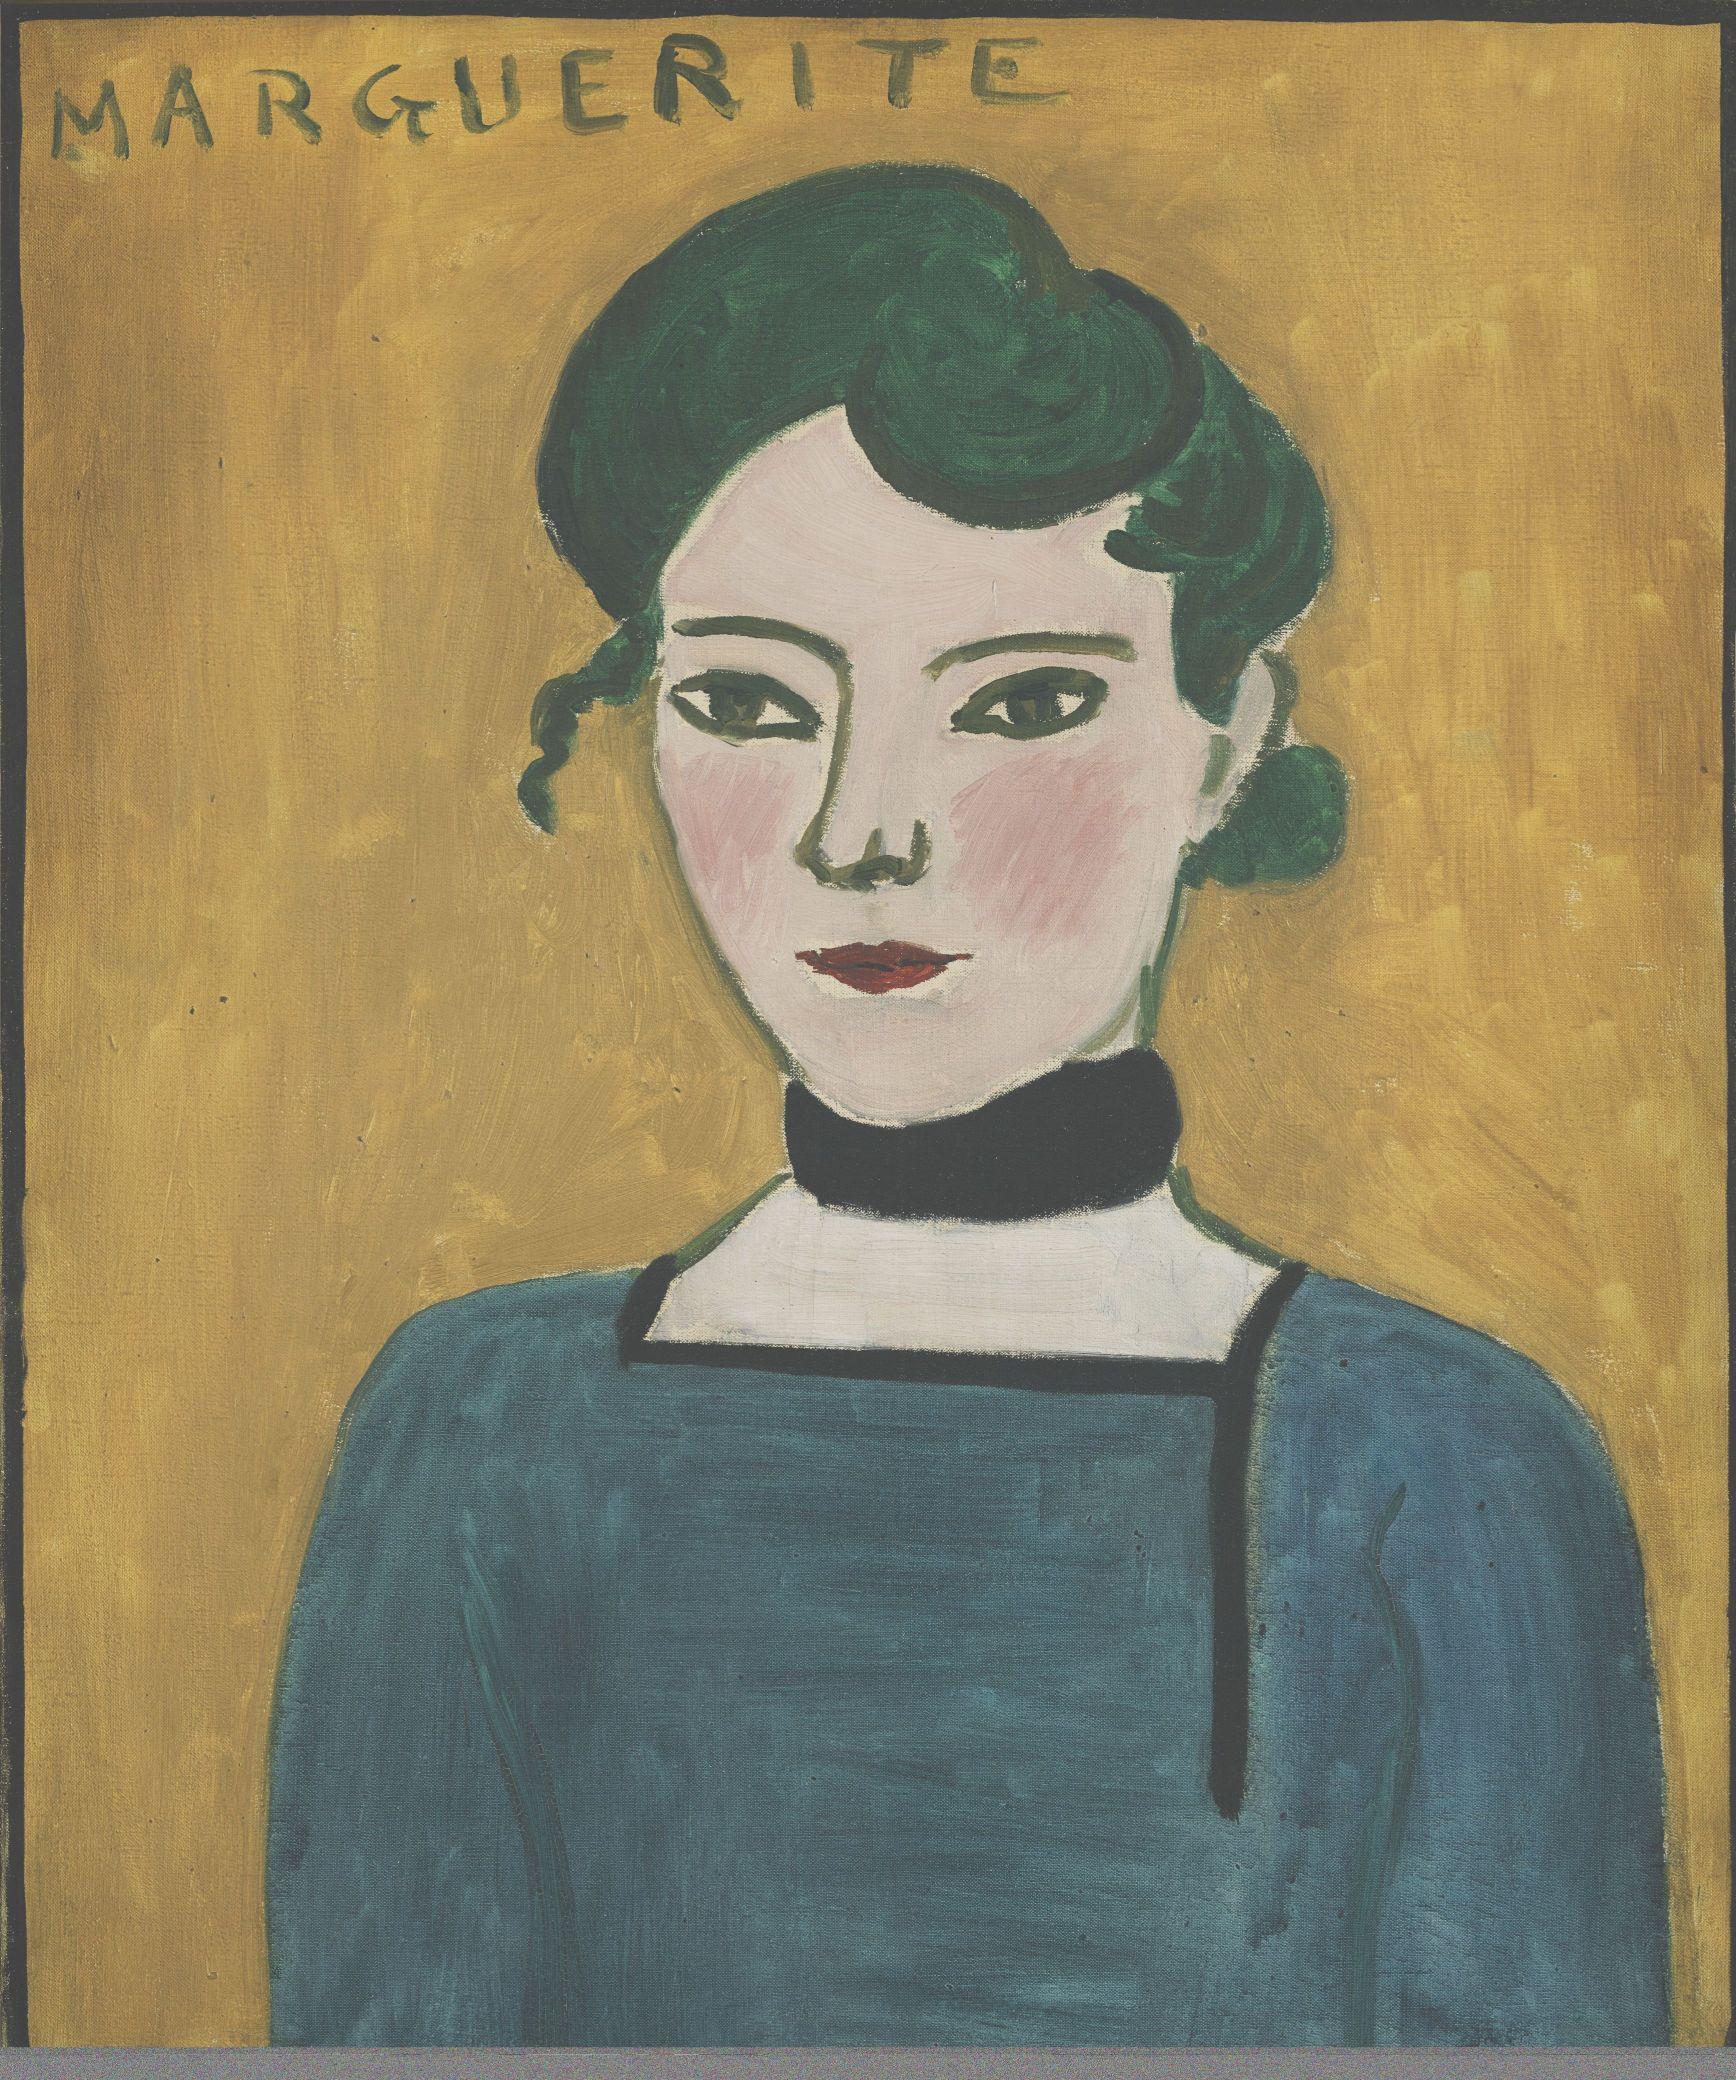 Henri Matisse, Marguerite, 1906 Öl auf Leinwand, 65 x 54 cm Paris, Musée Picasso © Succession H. Matisse/ VG Bild-Kunst, Bonn 2018 Foto: bpk | RMN - Grand Palais | René-Gabriel Ojéda